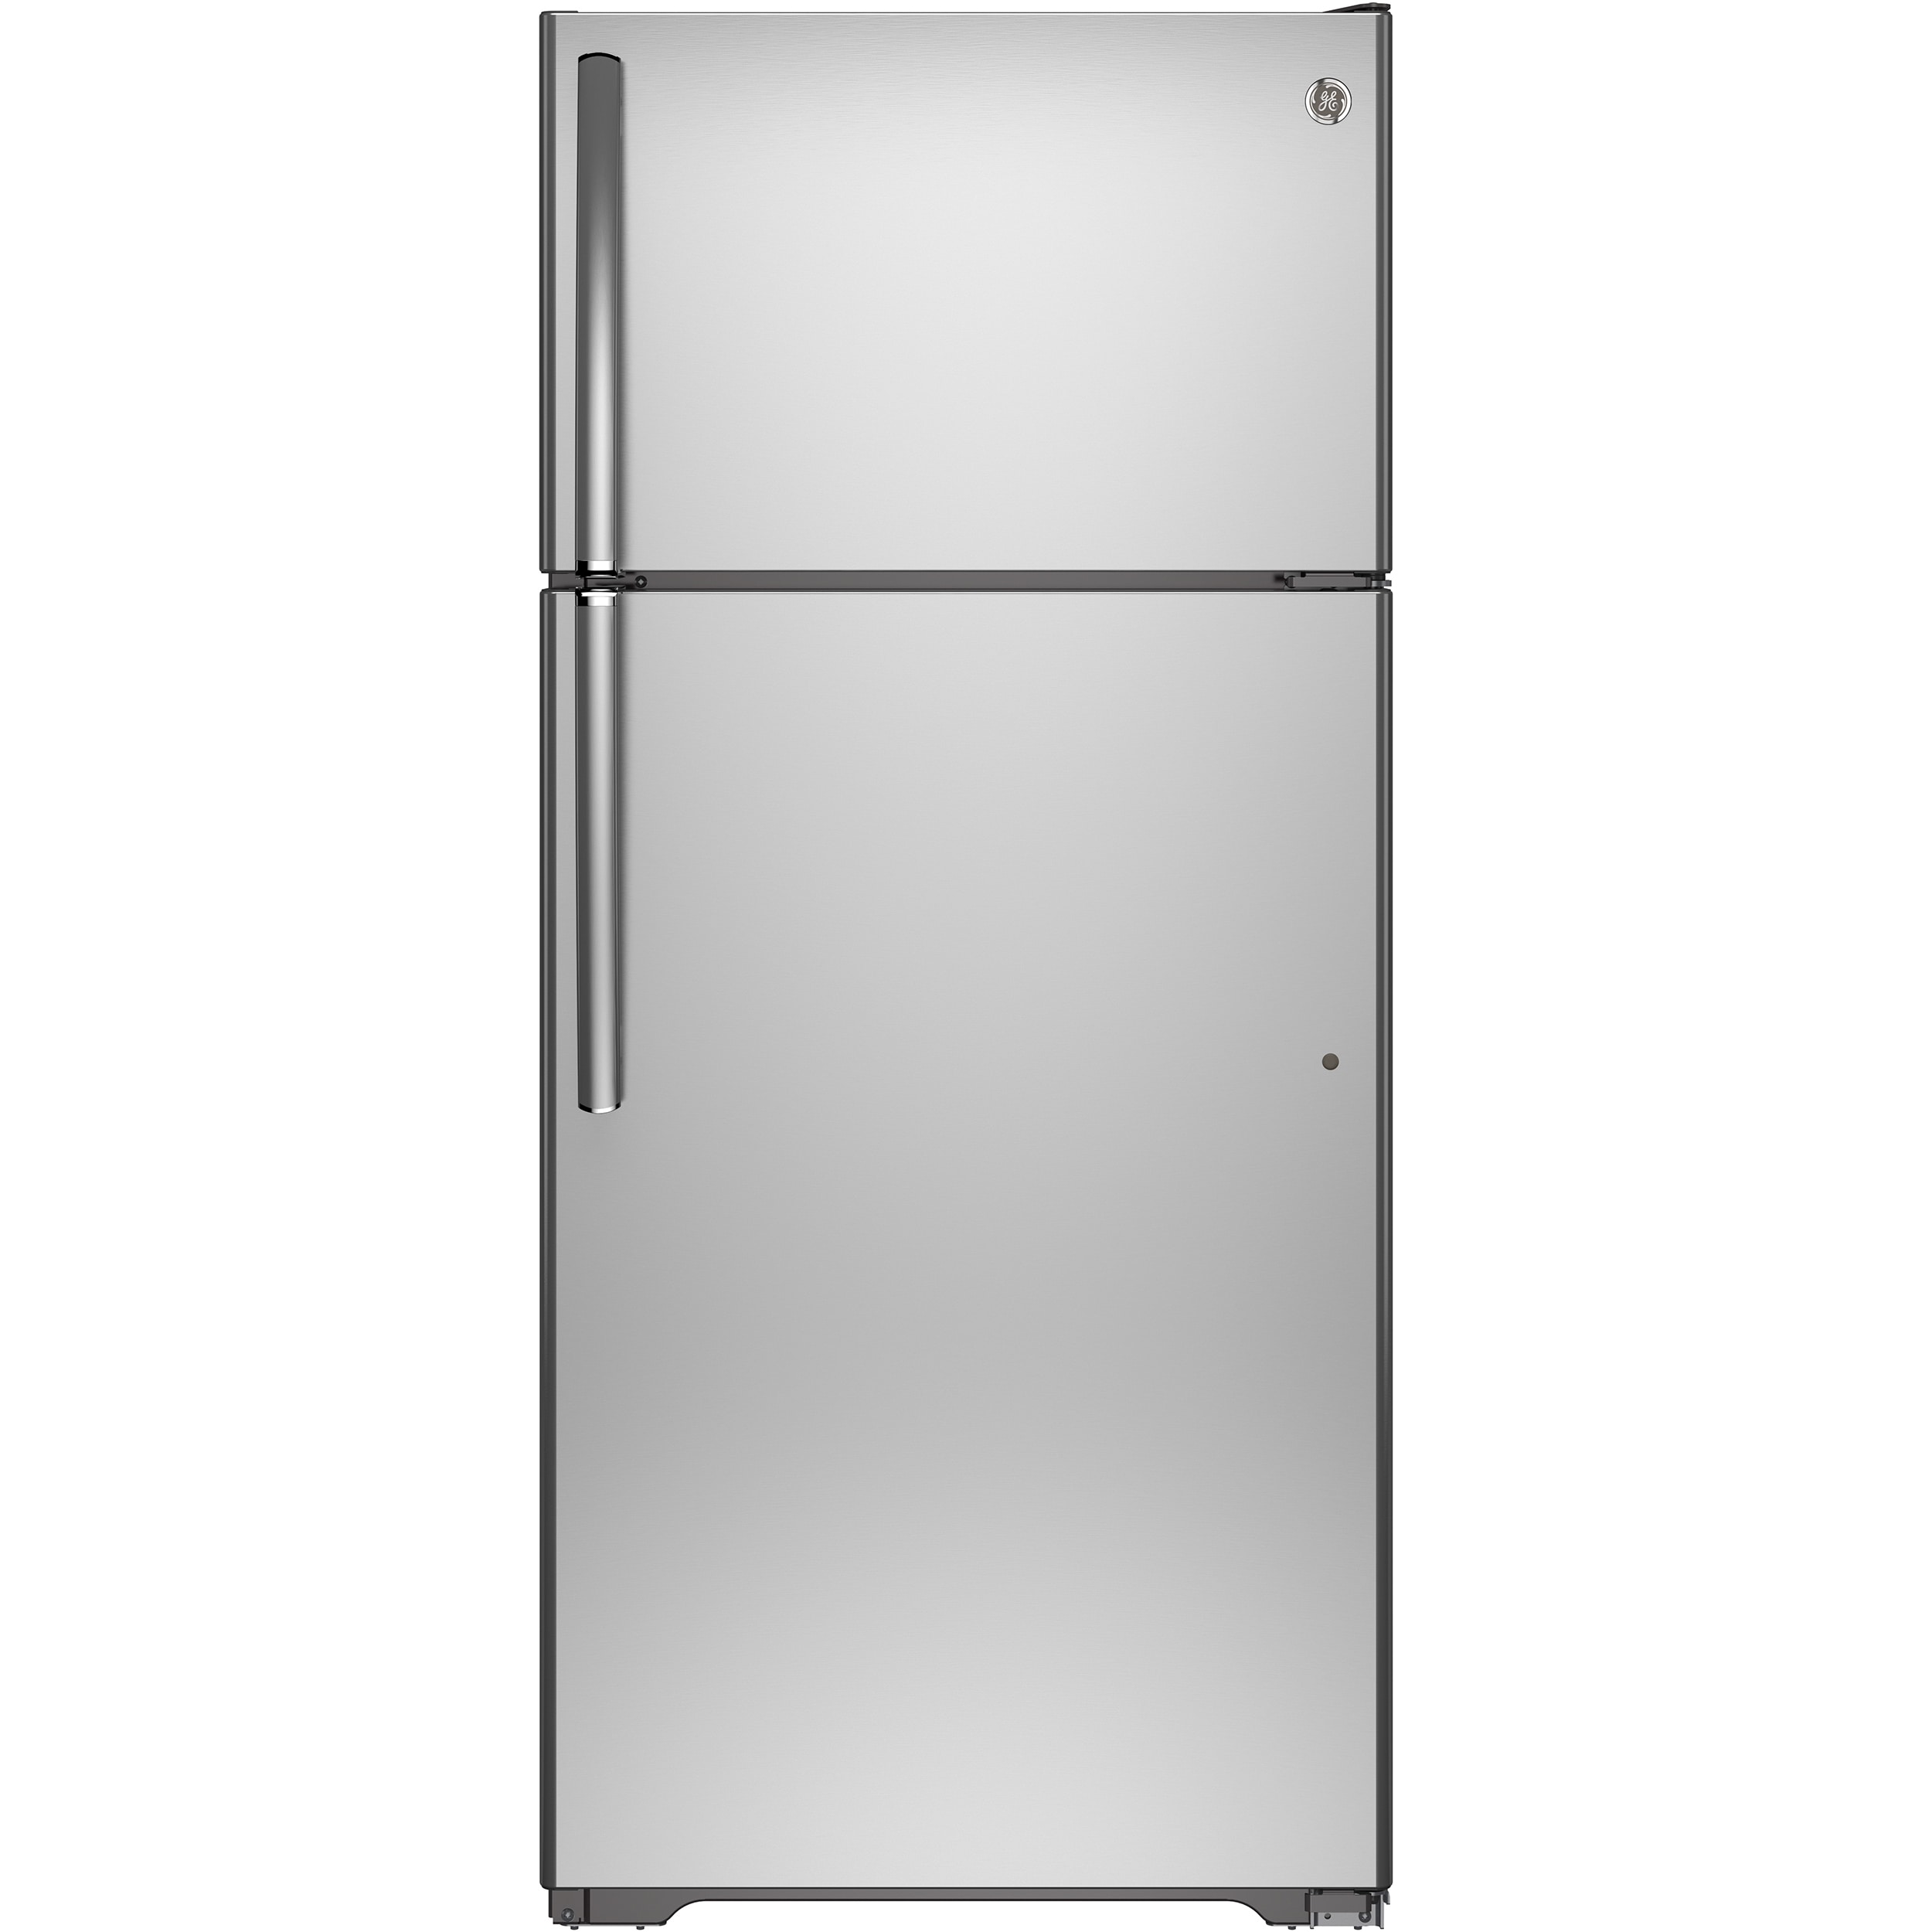 GE Energy Star 15.5 Cubic-foot Top-freezer Refrigerator (...